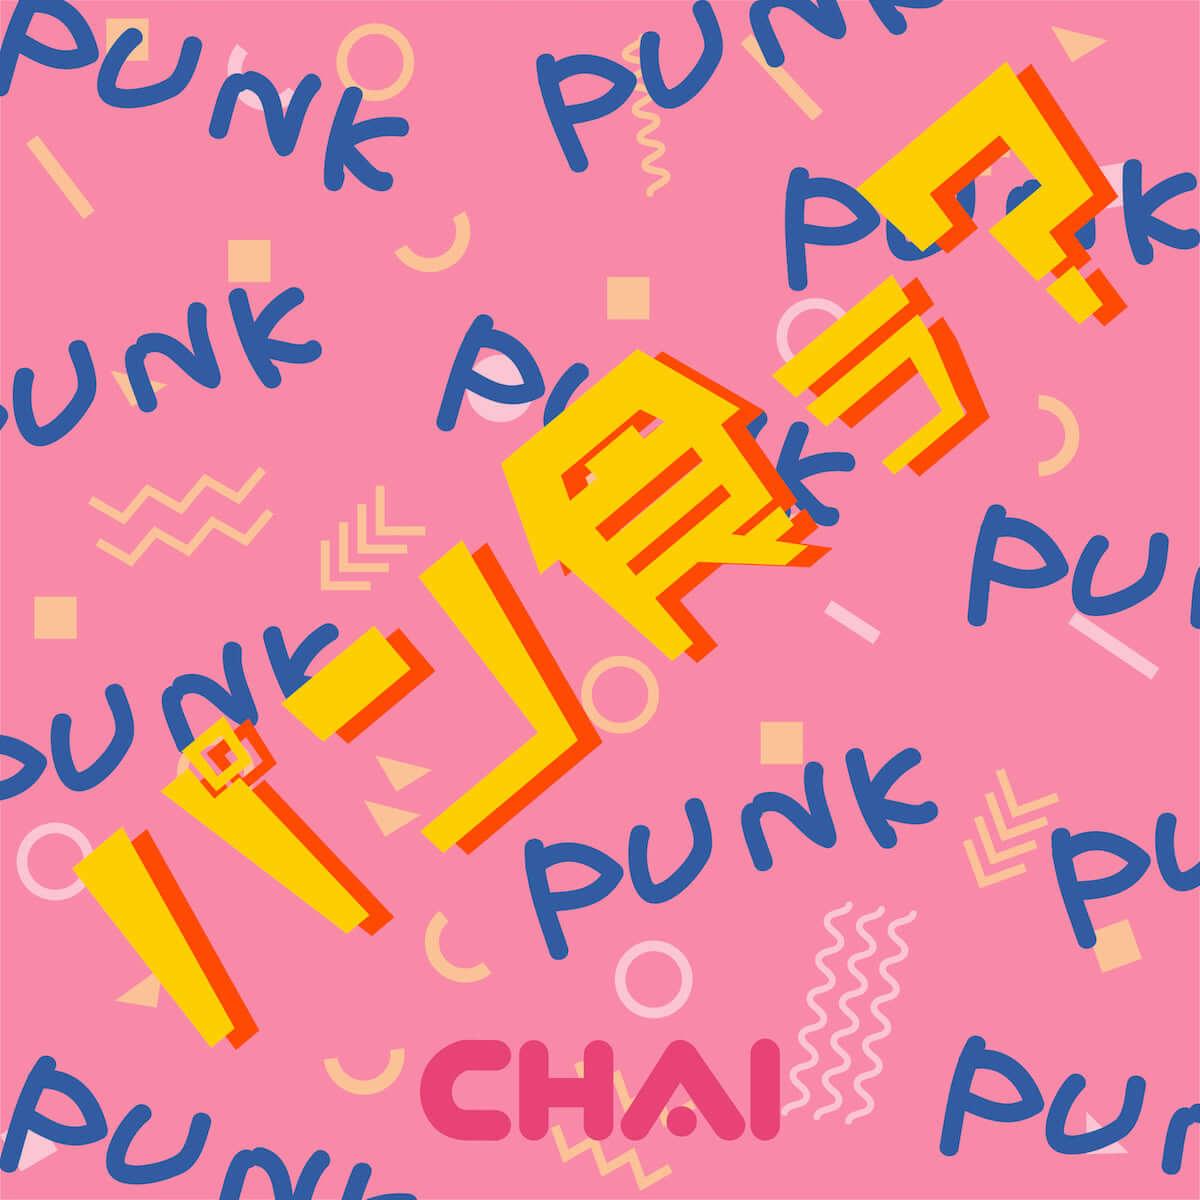 CHAI、<一緒にPUNKぅ?(パン食ぅ)>イベントを2月23日に原宿で開催決定!2ndアルバム『PUNK』発売記念 music190222_chai_1-1200x1200